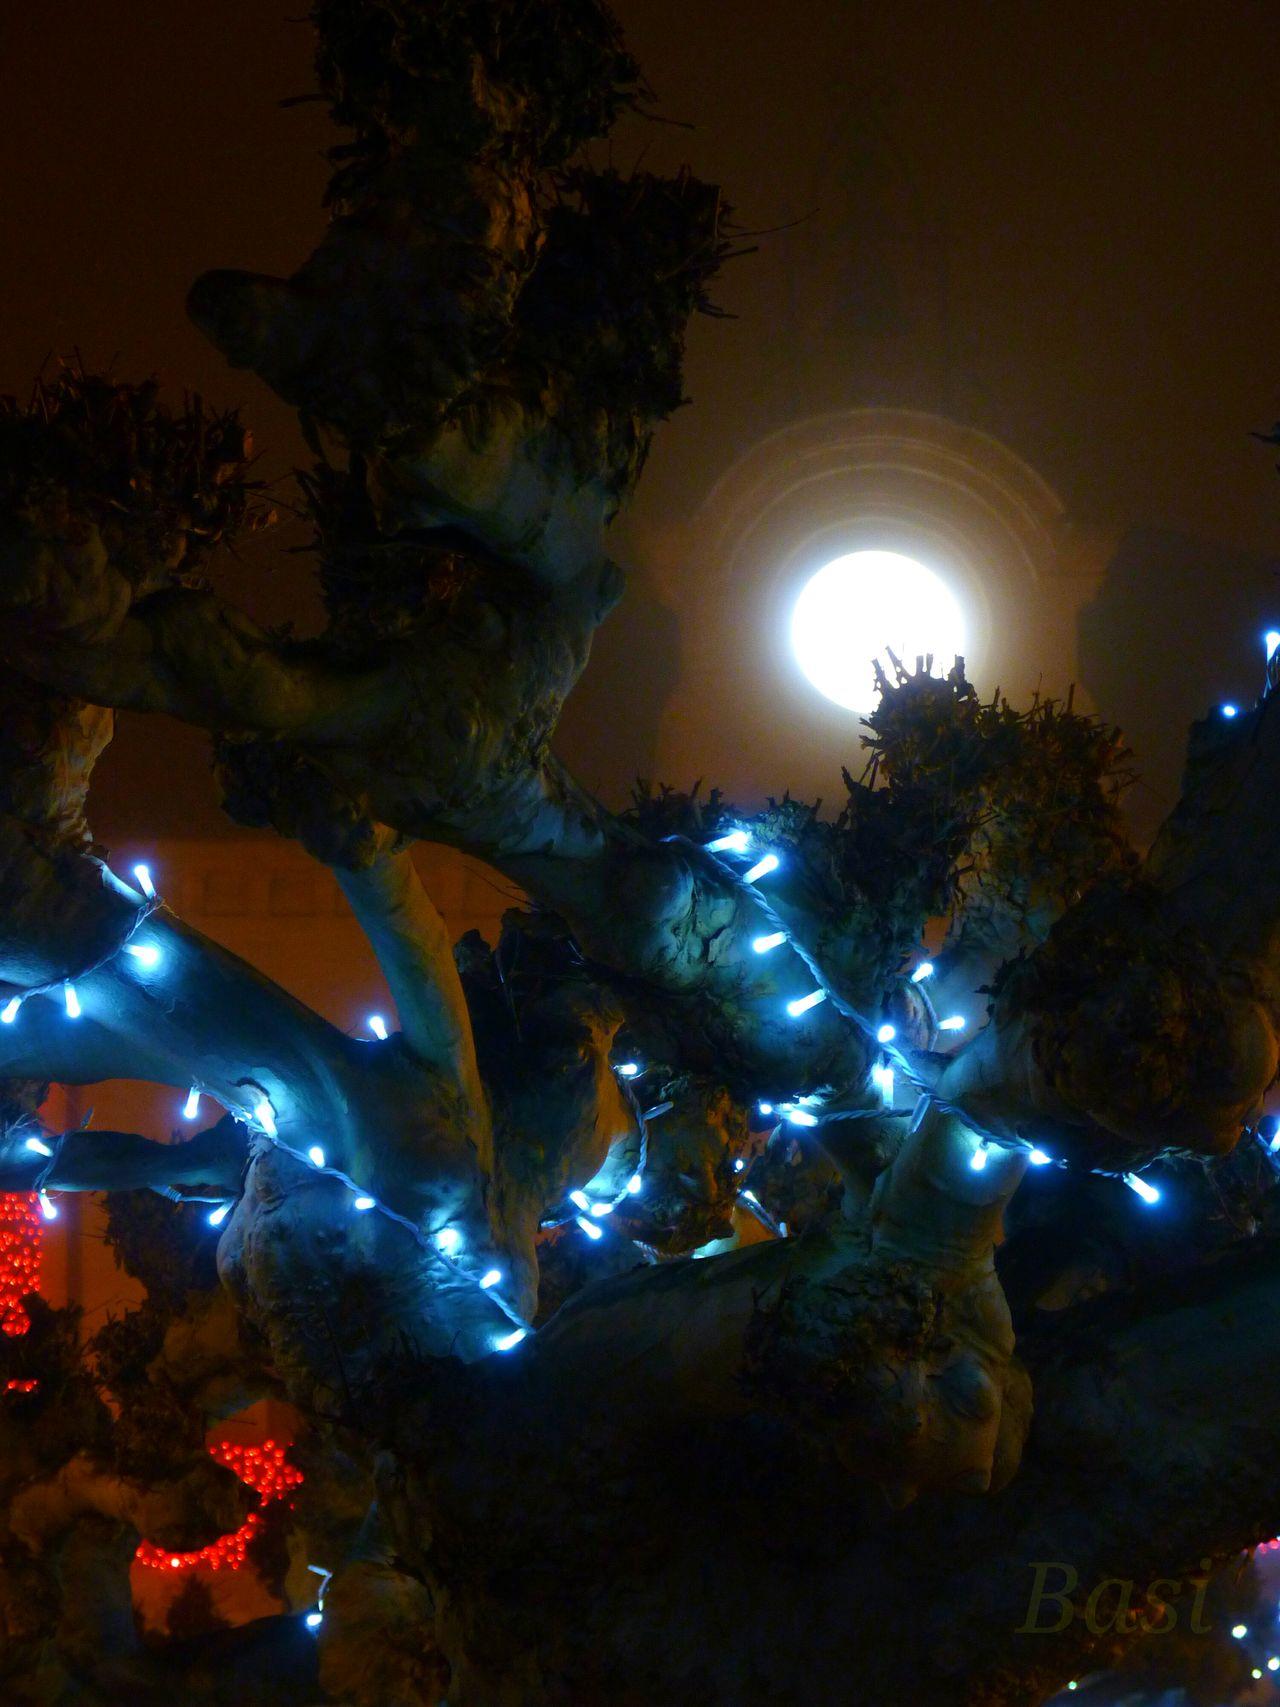 Night Tree No People Illuminated Moon Moonlight Close-up Outdoors EyeEmNewHere Bluelight